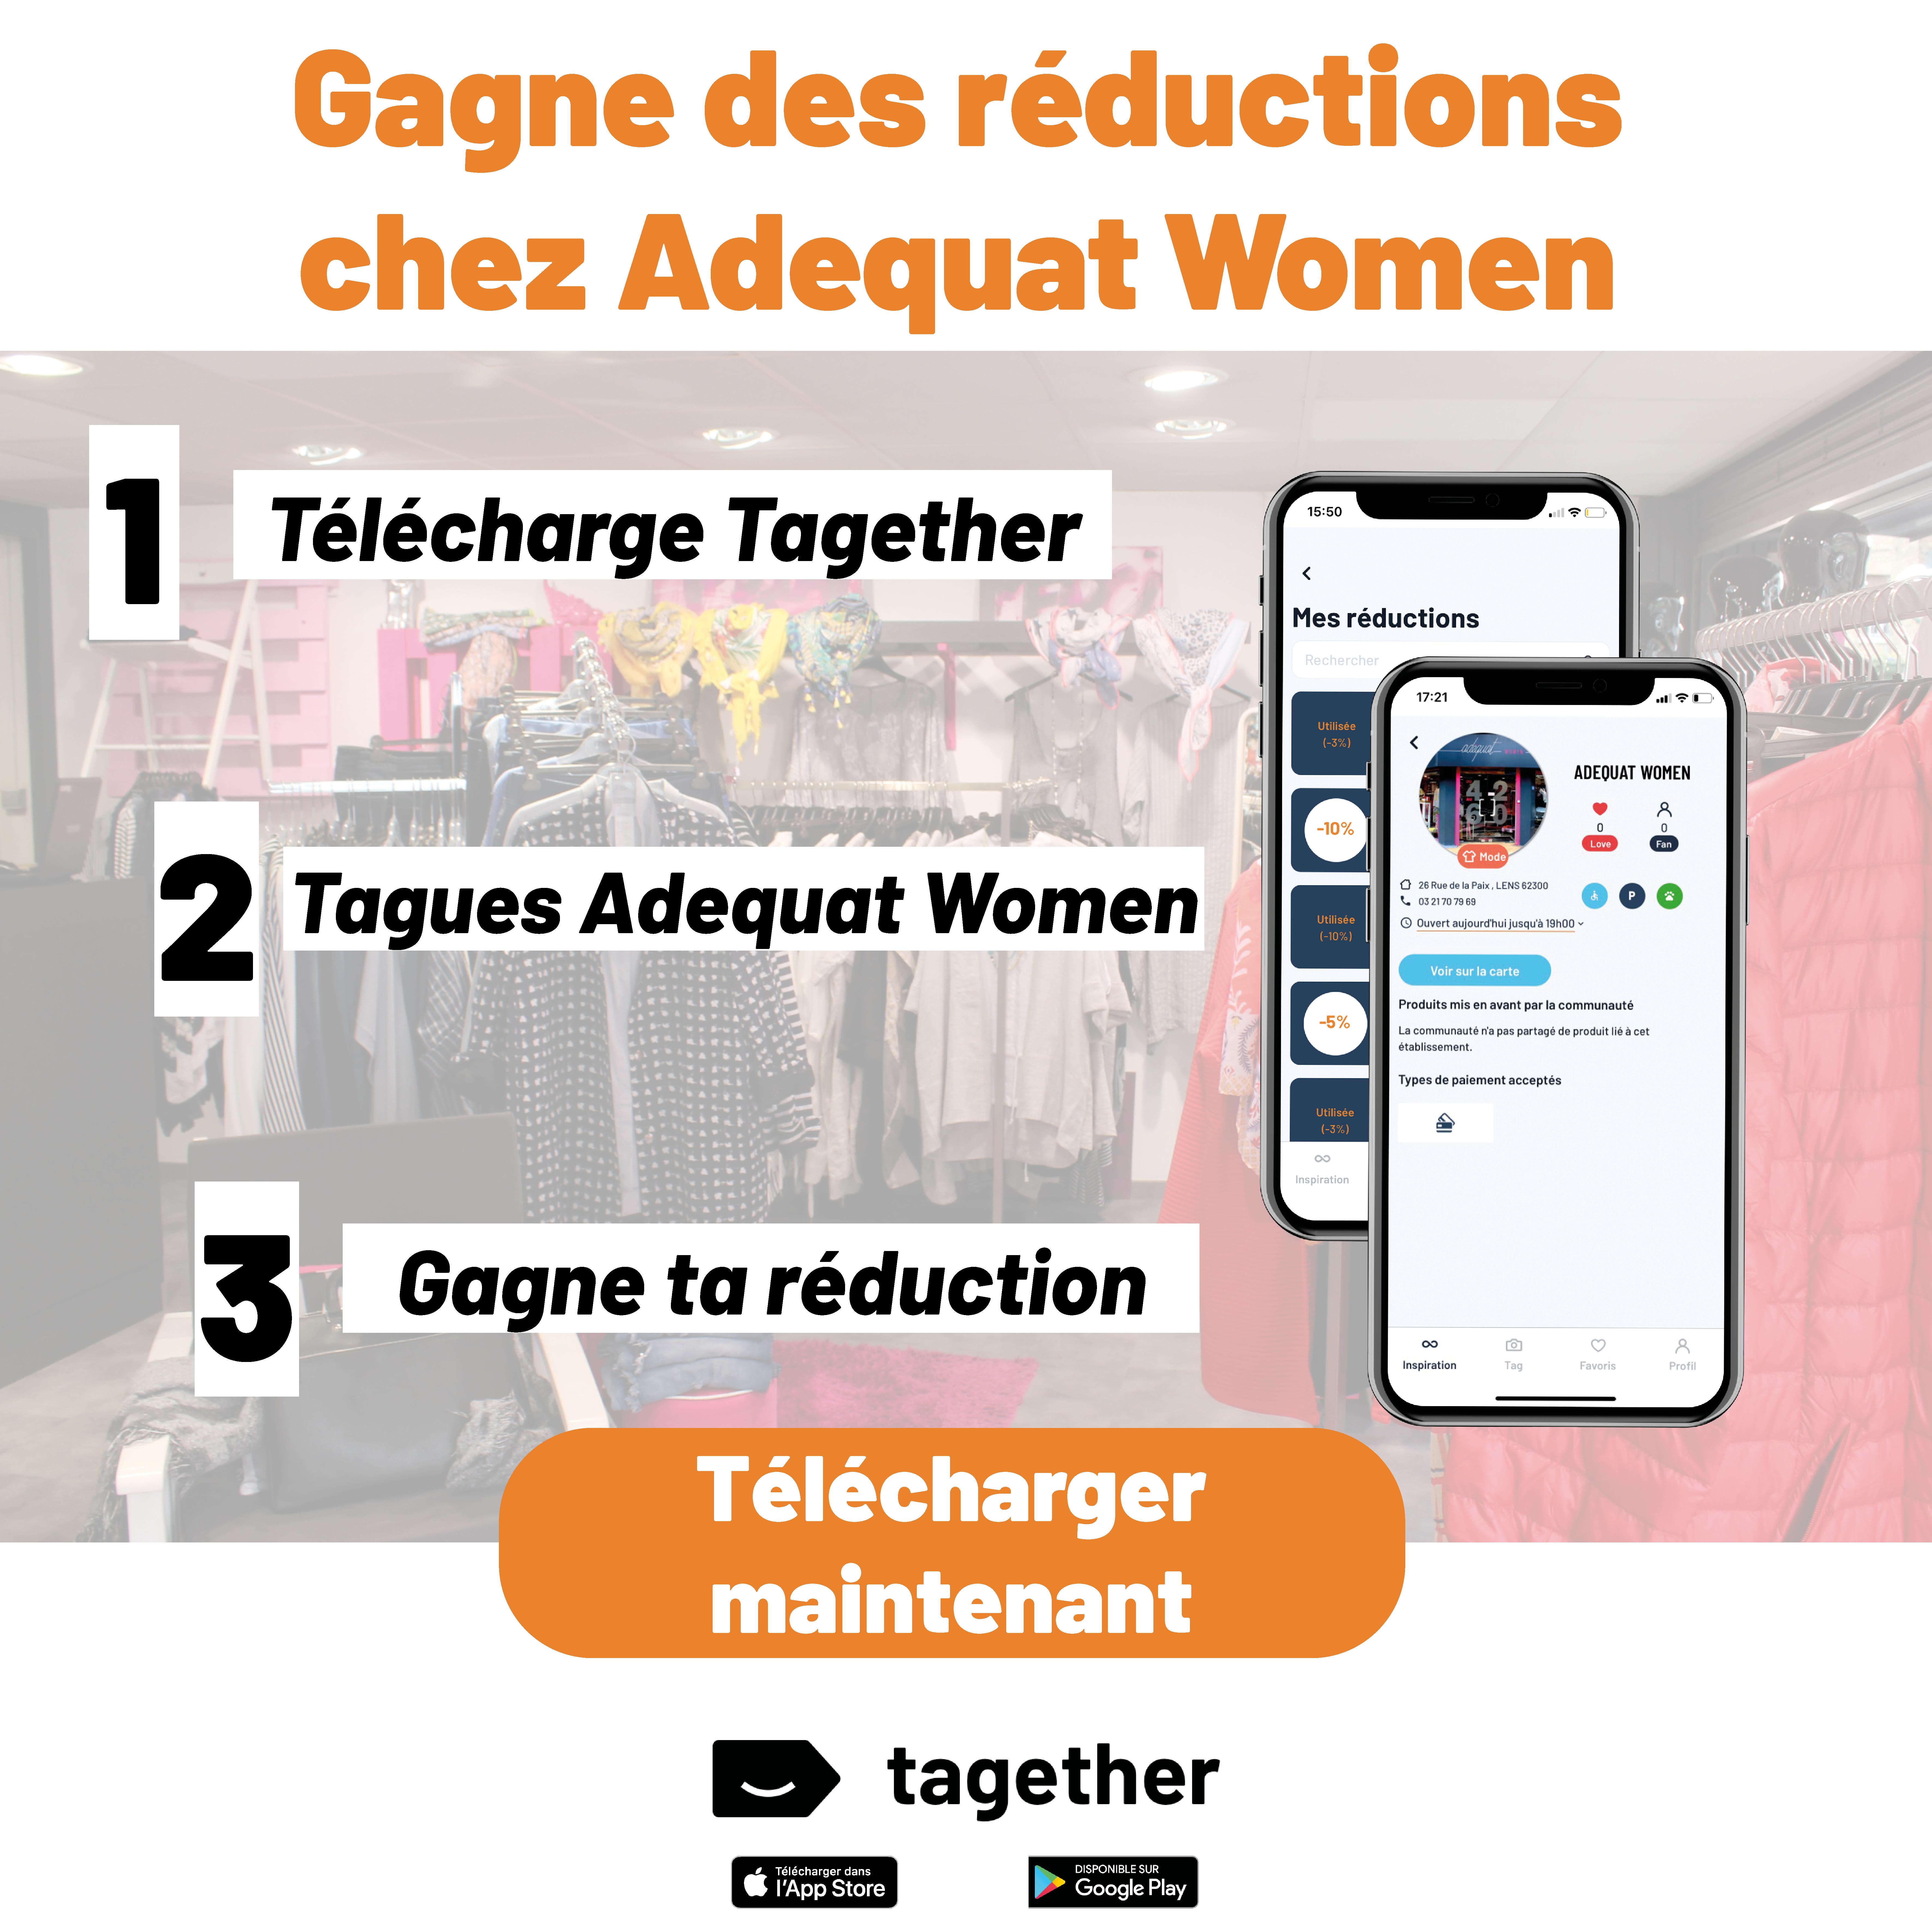 Adequat Women Lens